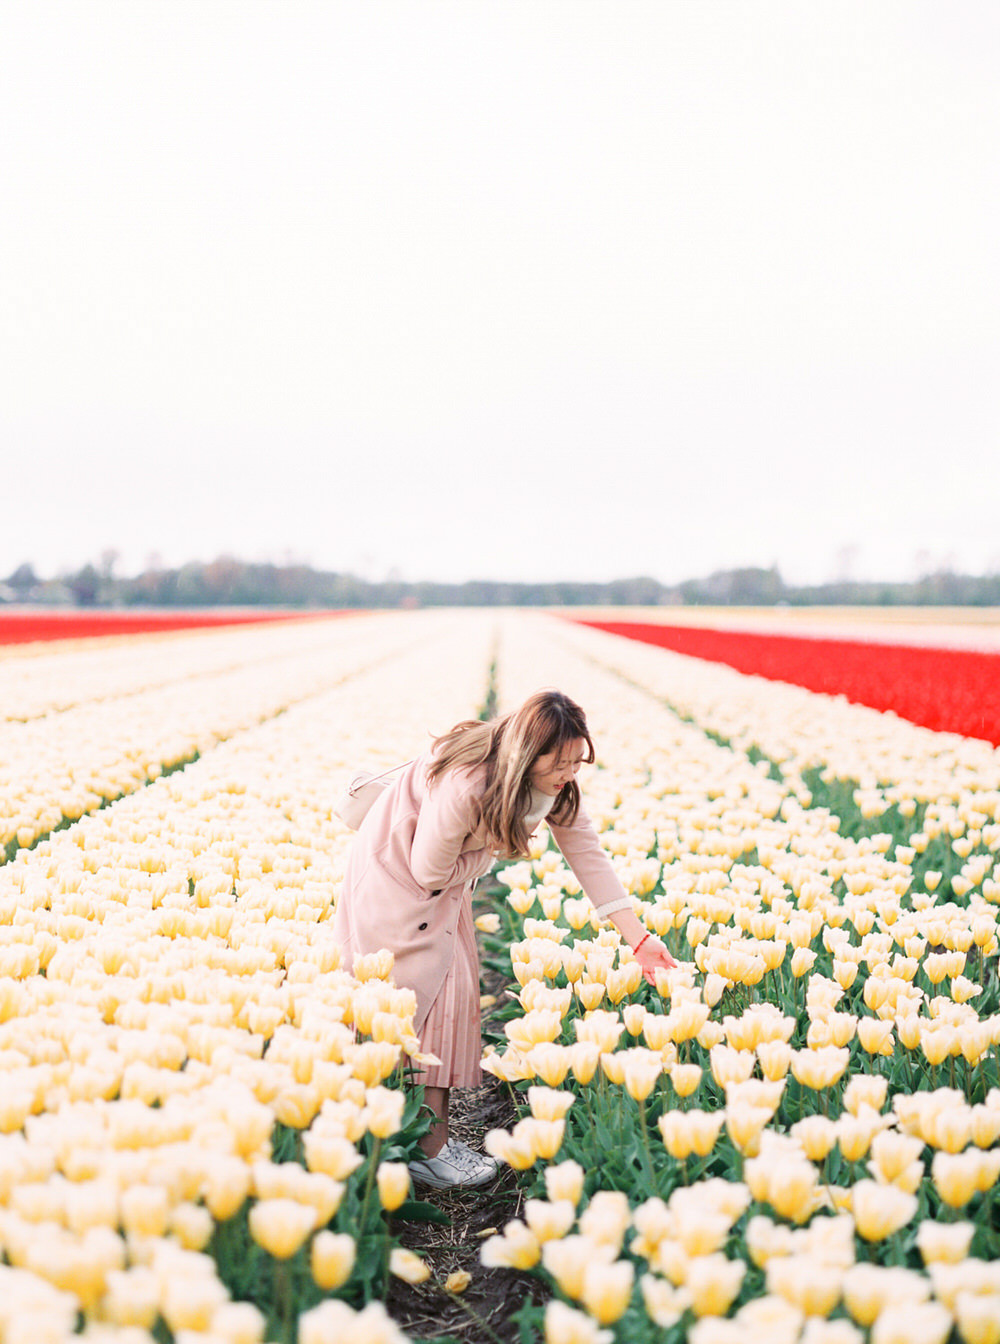 Keukenhof Lisse Tulip Field Portrait Photography - CHYMO & MORE